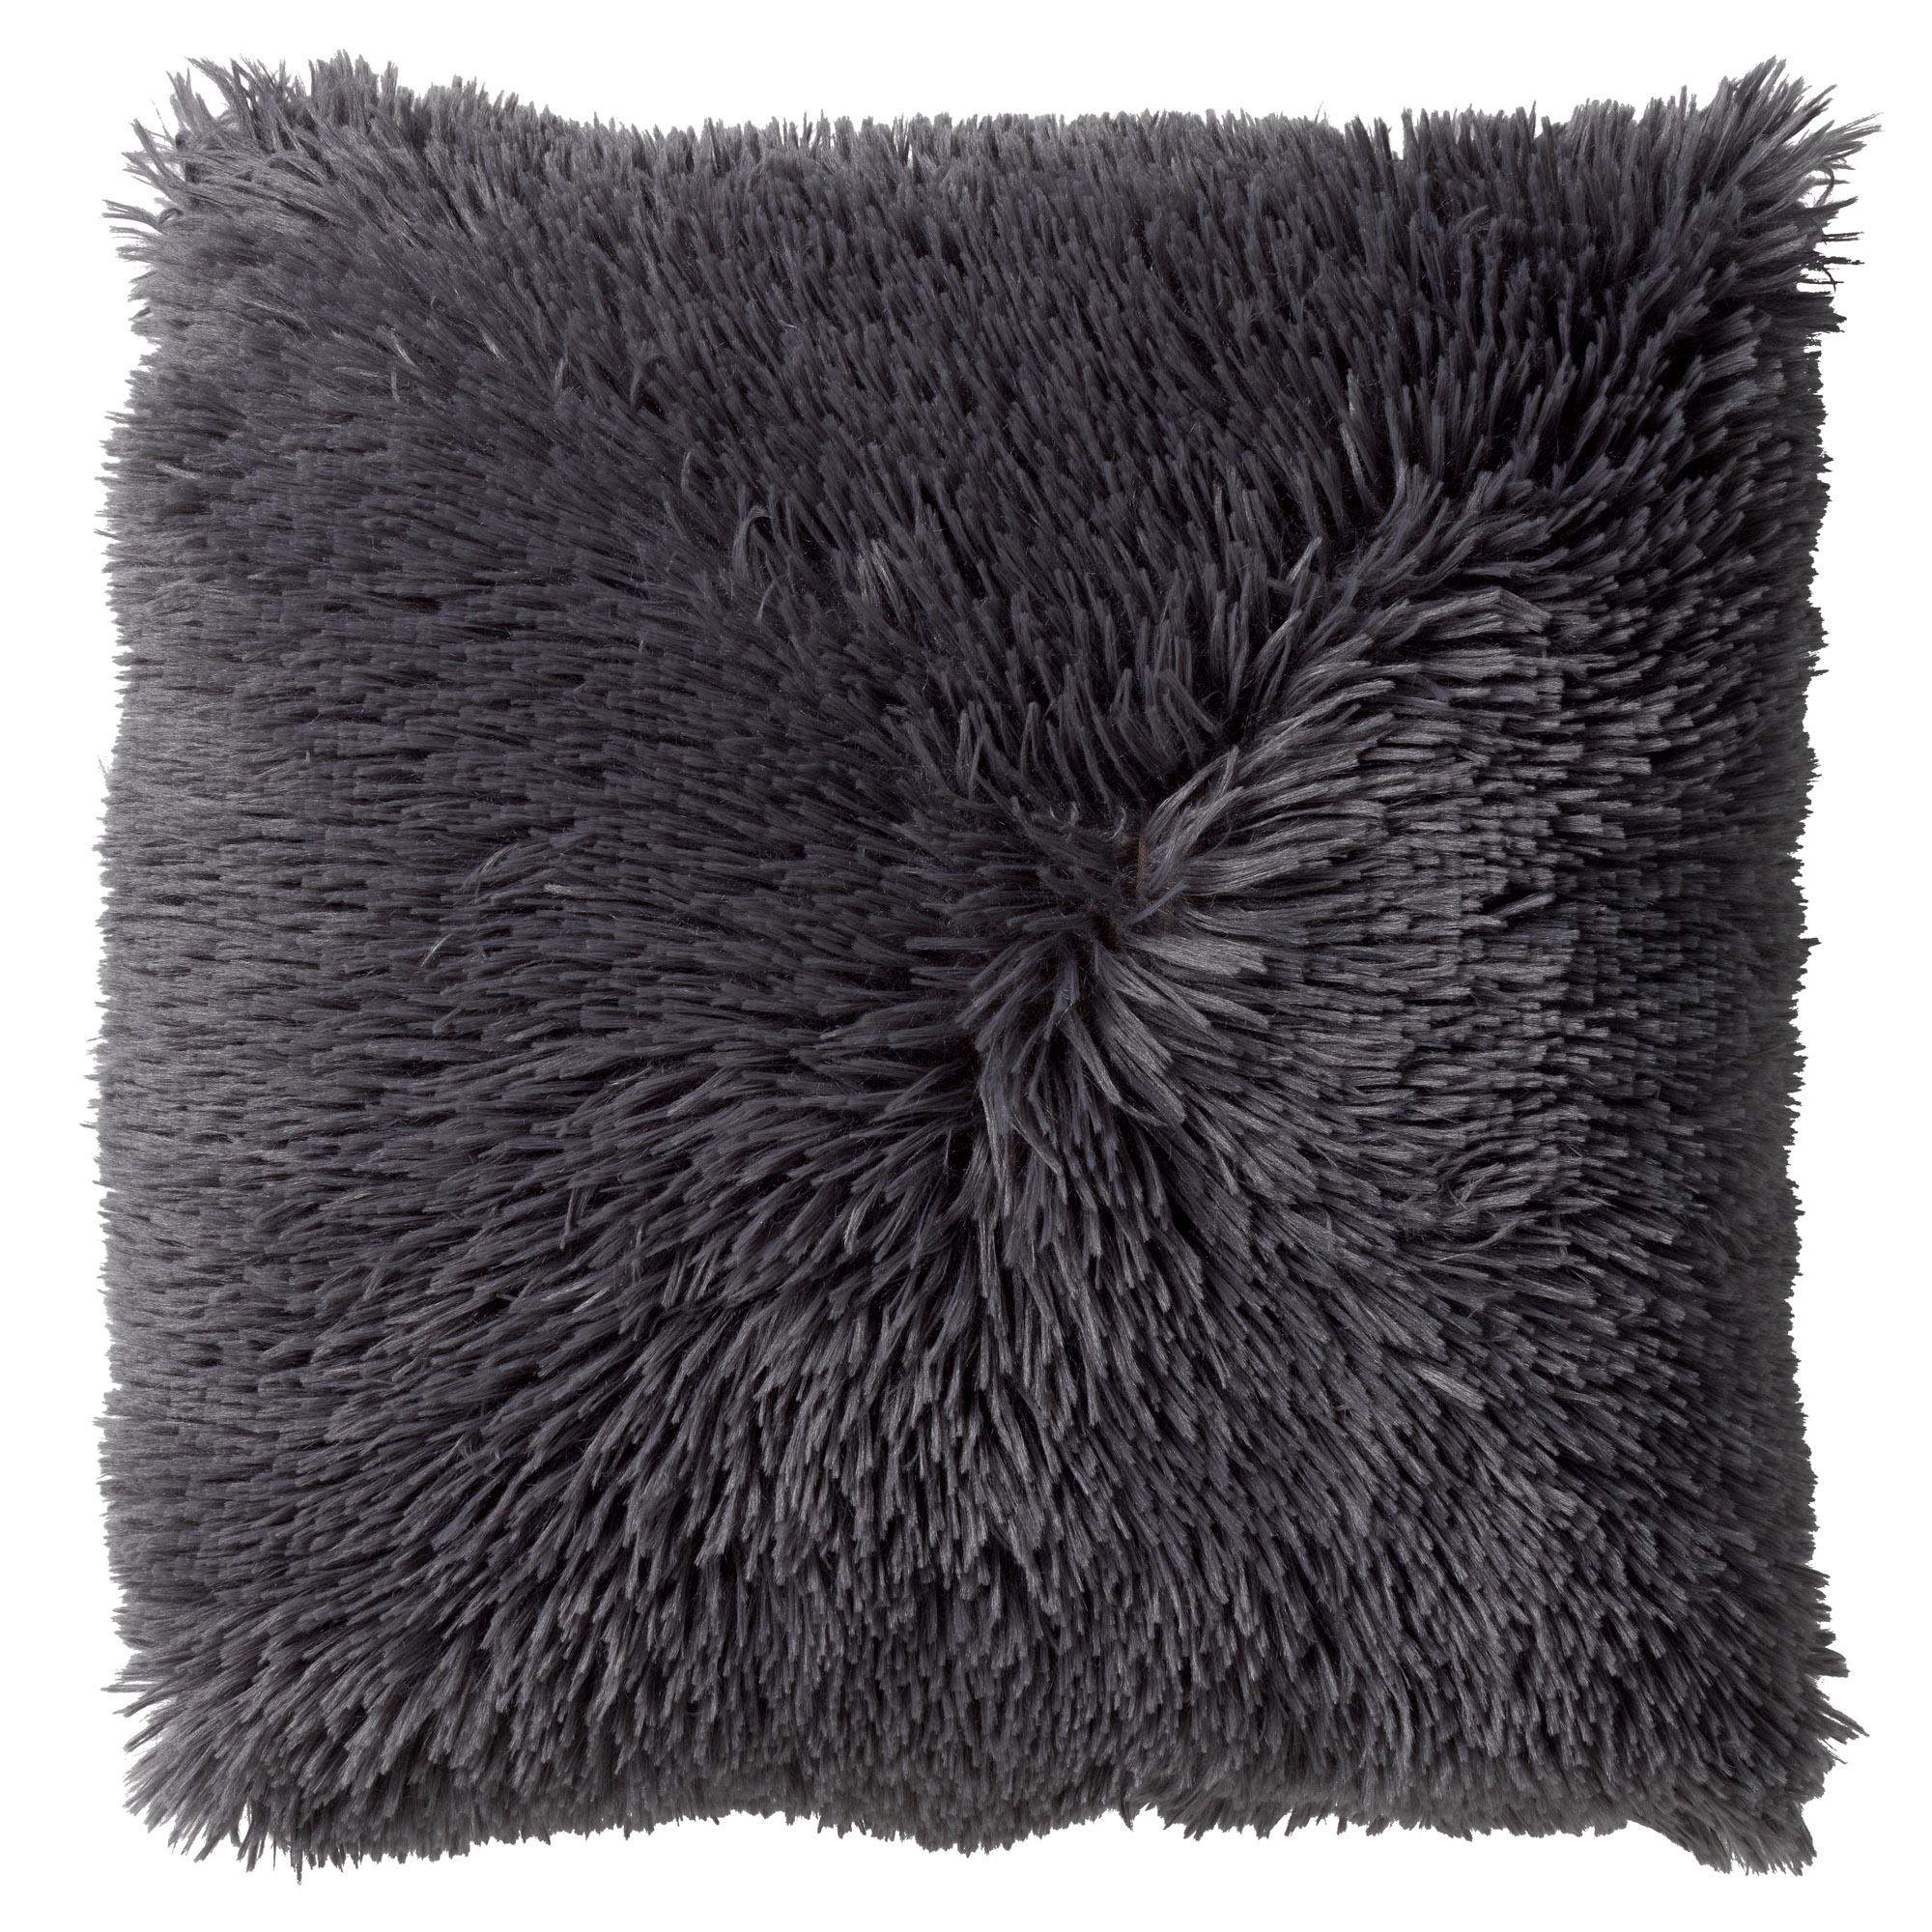 FLUFFY - Sierkussen unikleur donkergrijs 45x45 cm